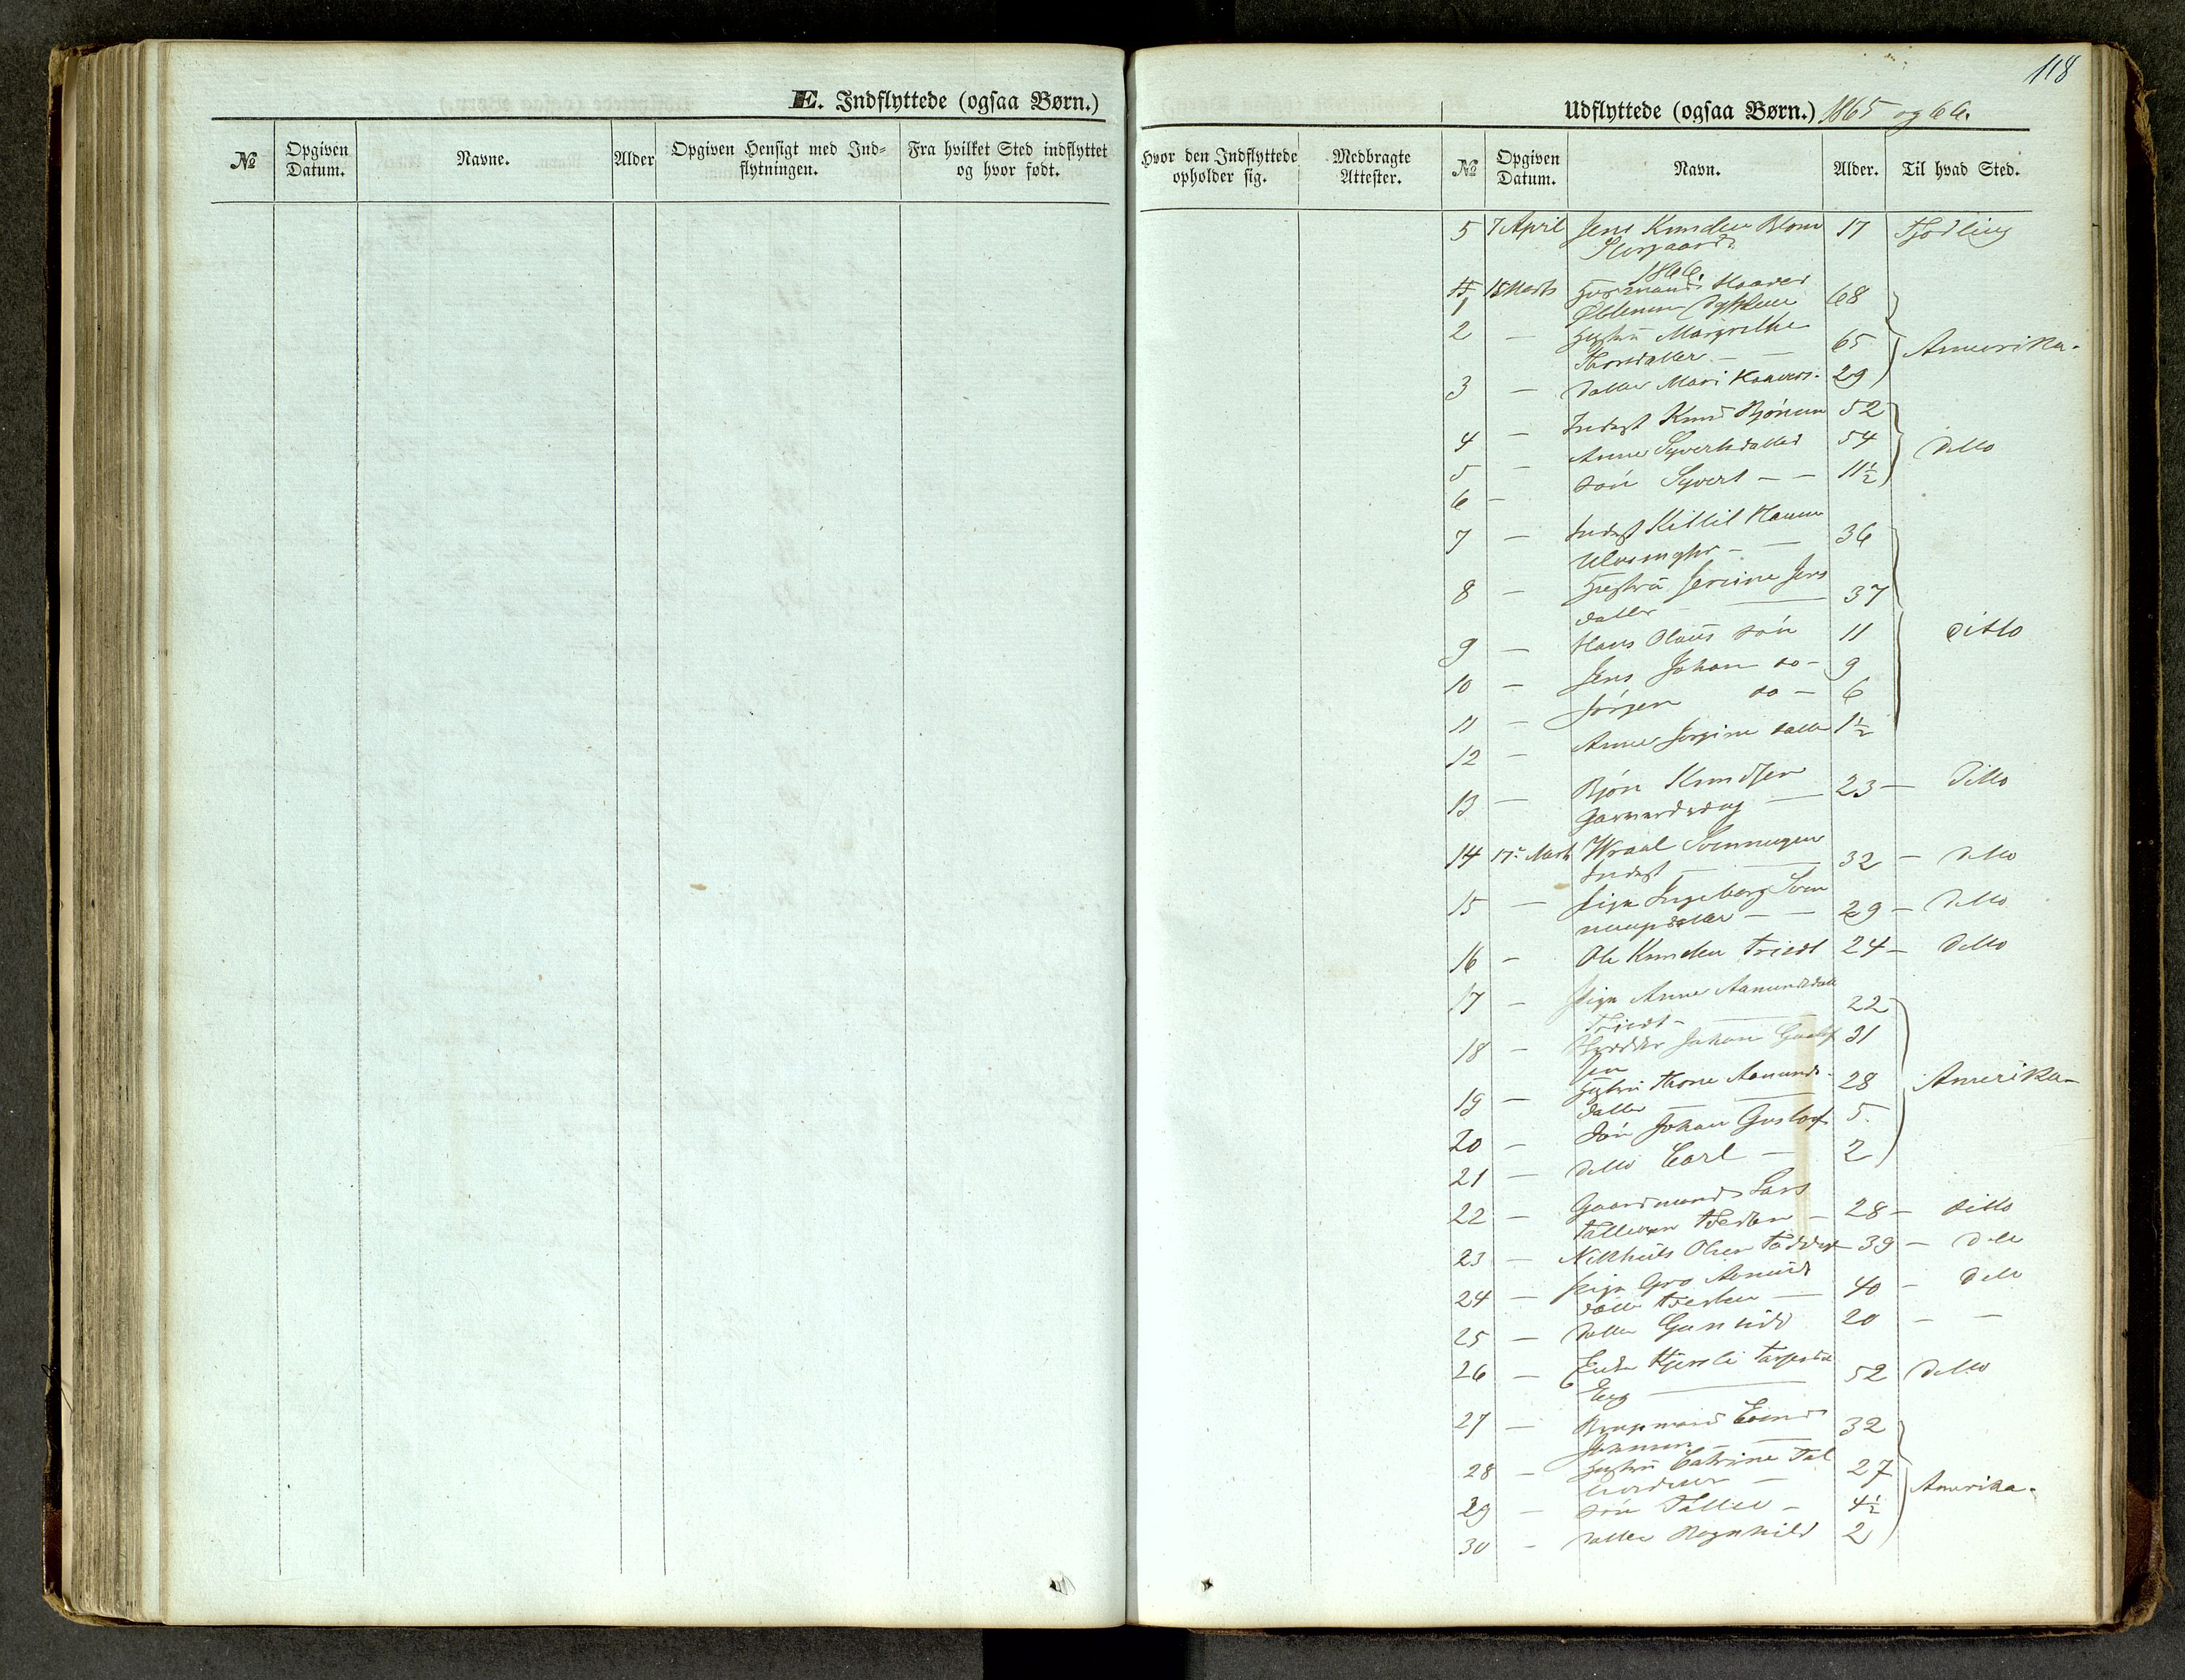 SAKO, Lårdal kirkebøker, G/Ga/L0002: Klokkerbok nr. I 2, 1861-1890, s. 118